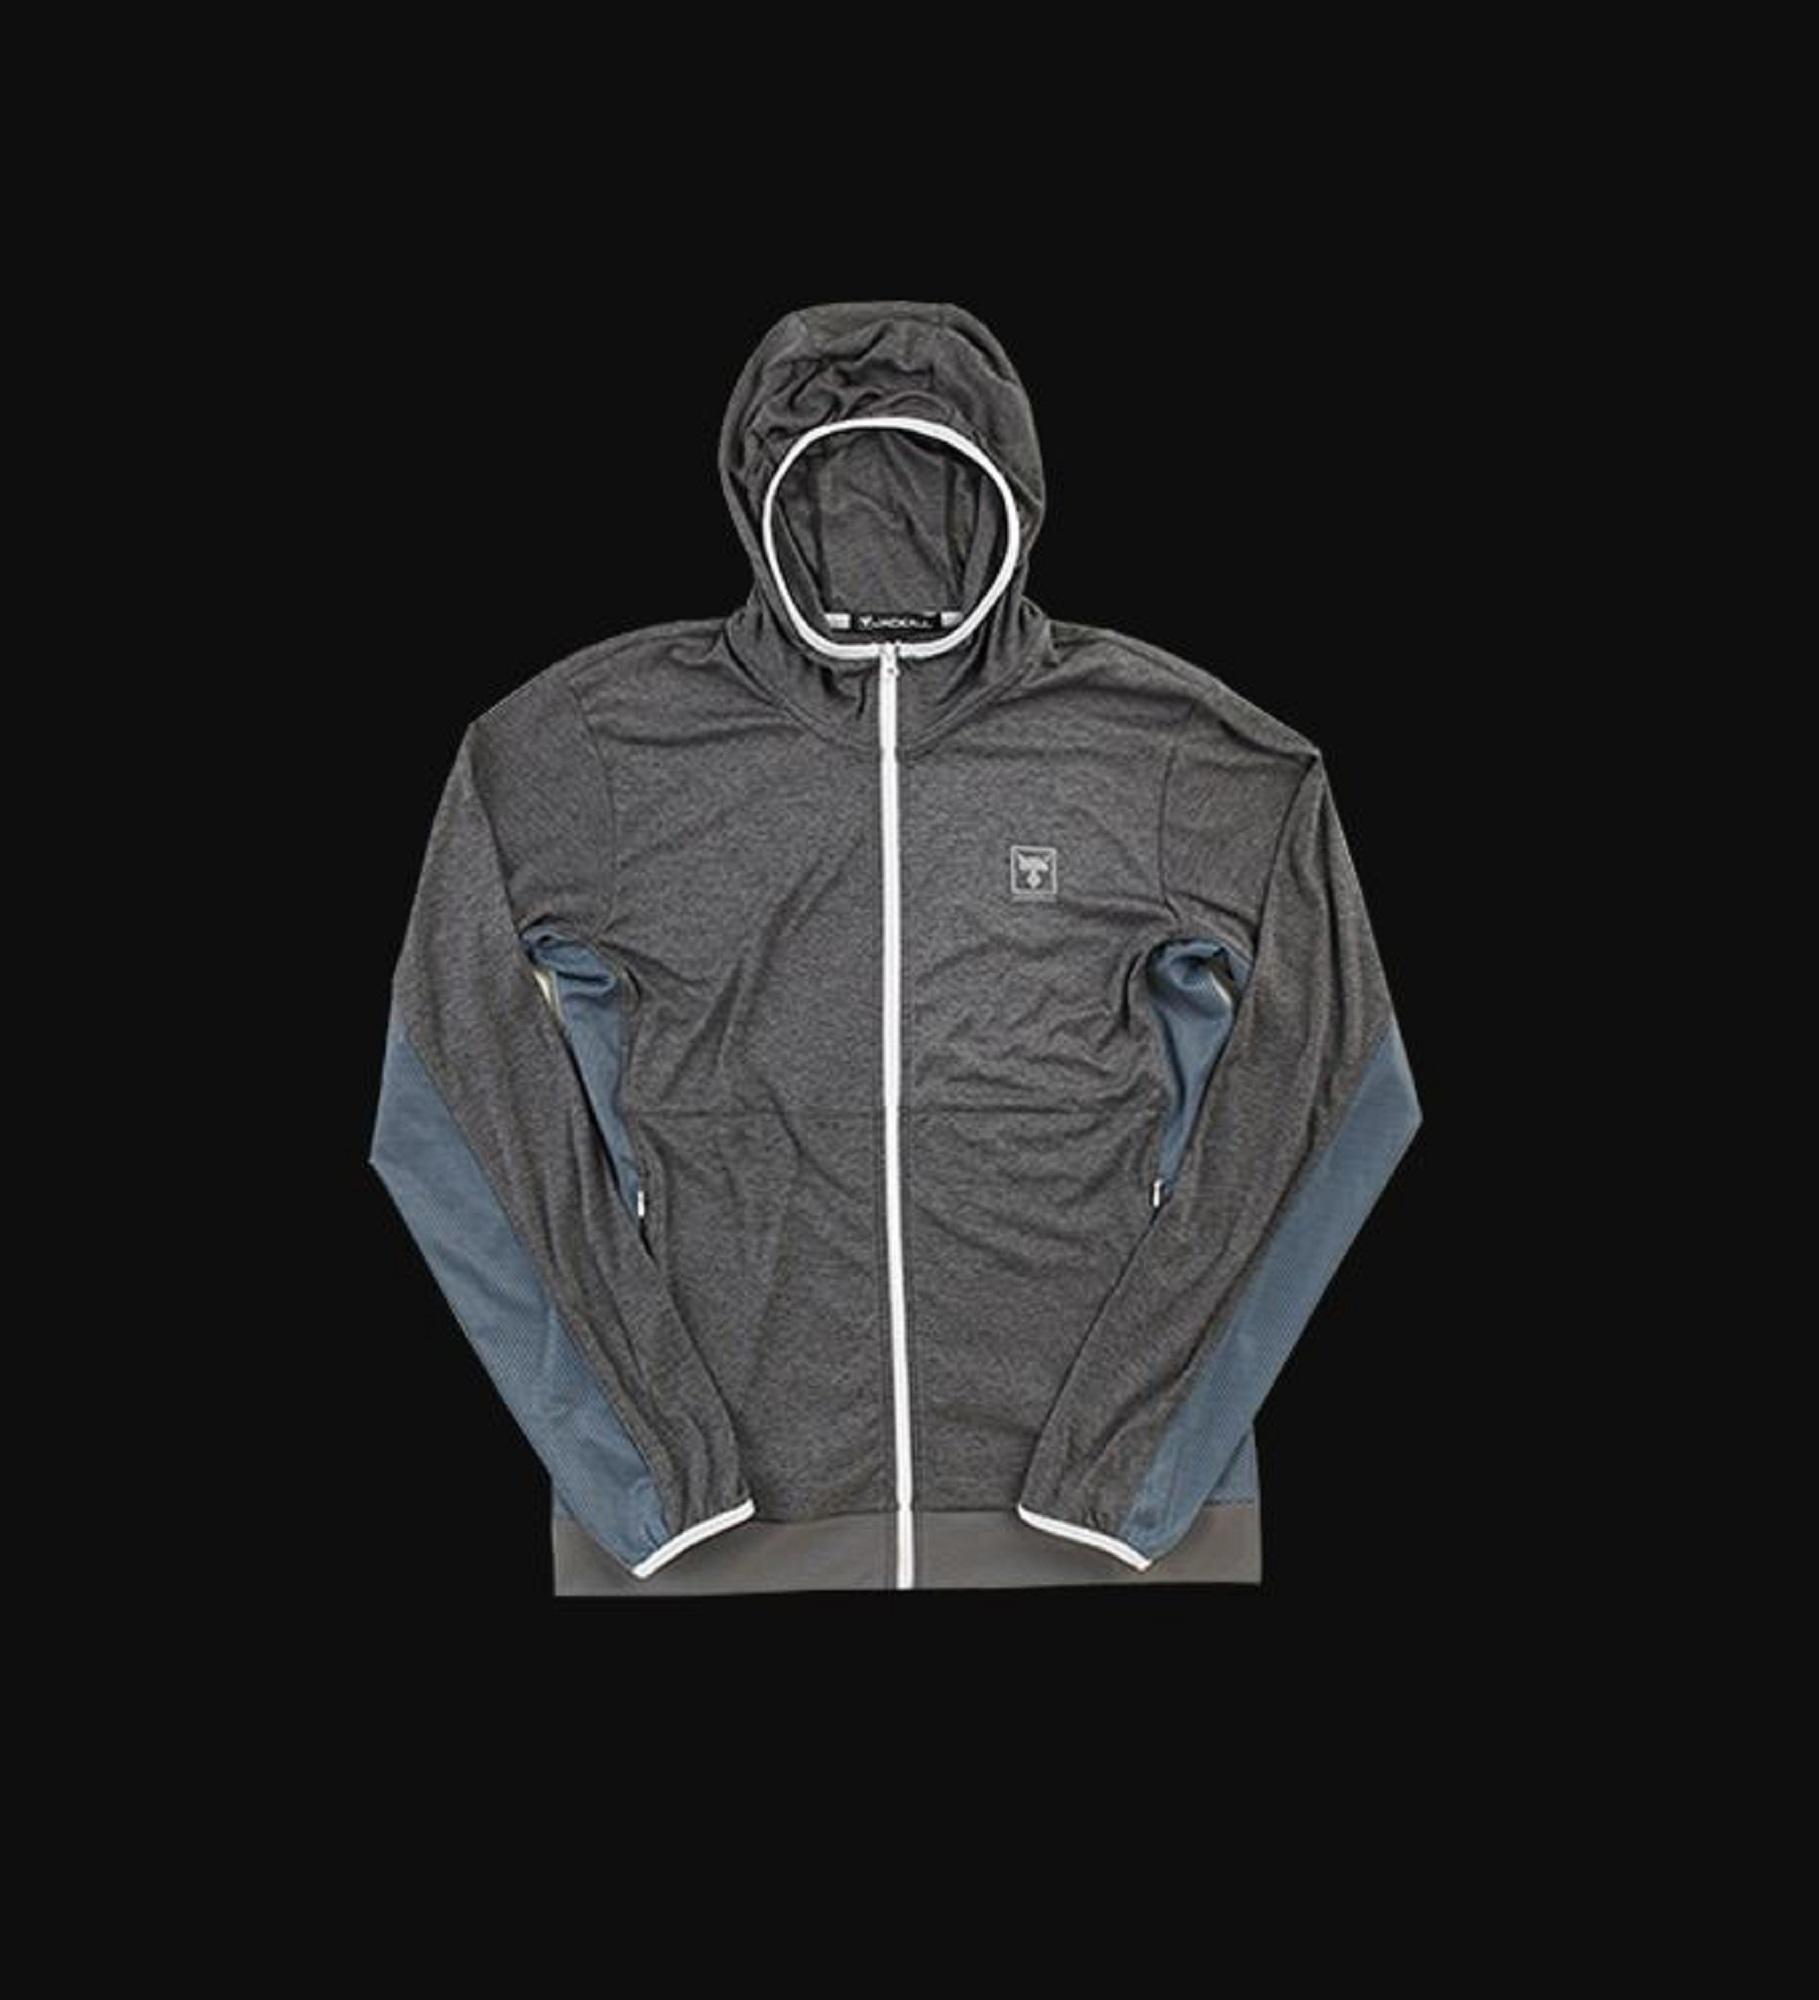 Jackall Light Hoodie Original Merchandise Size L Black (8836)